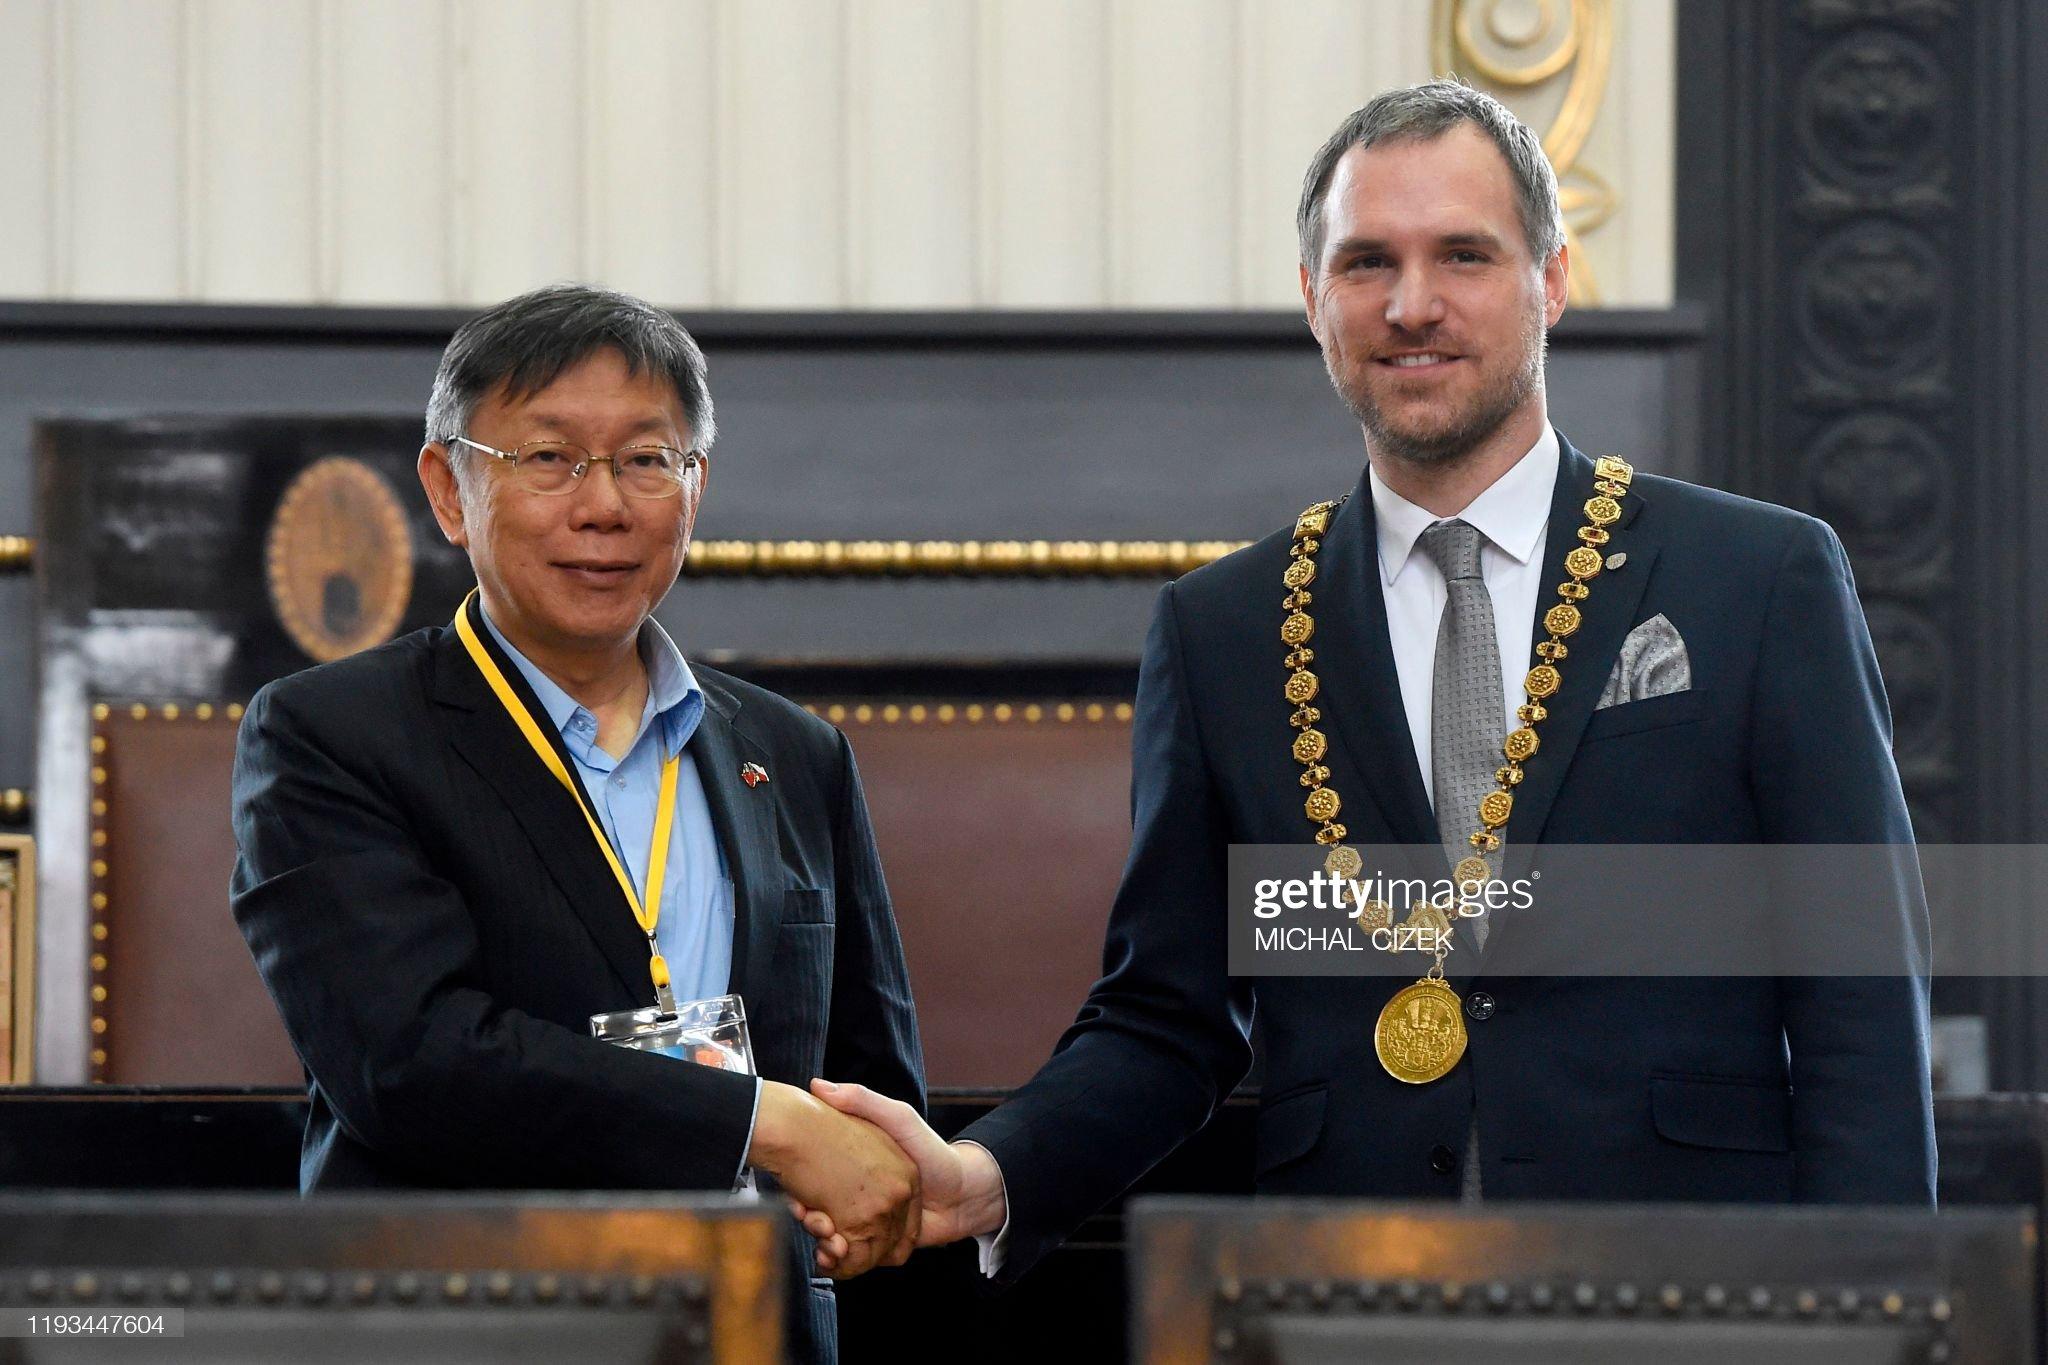 CZECH-TAIWAN-POLITICS-DIPLOMACY : News Photo